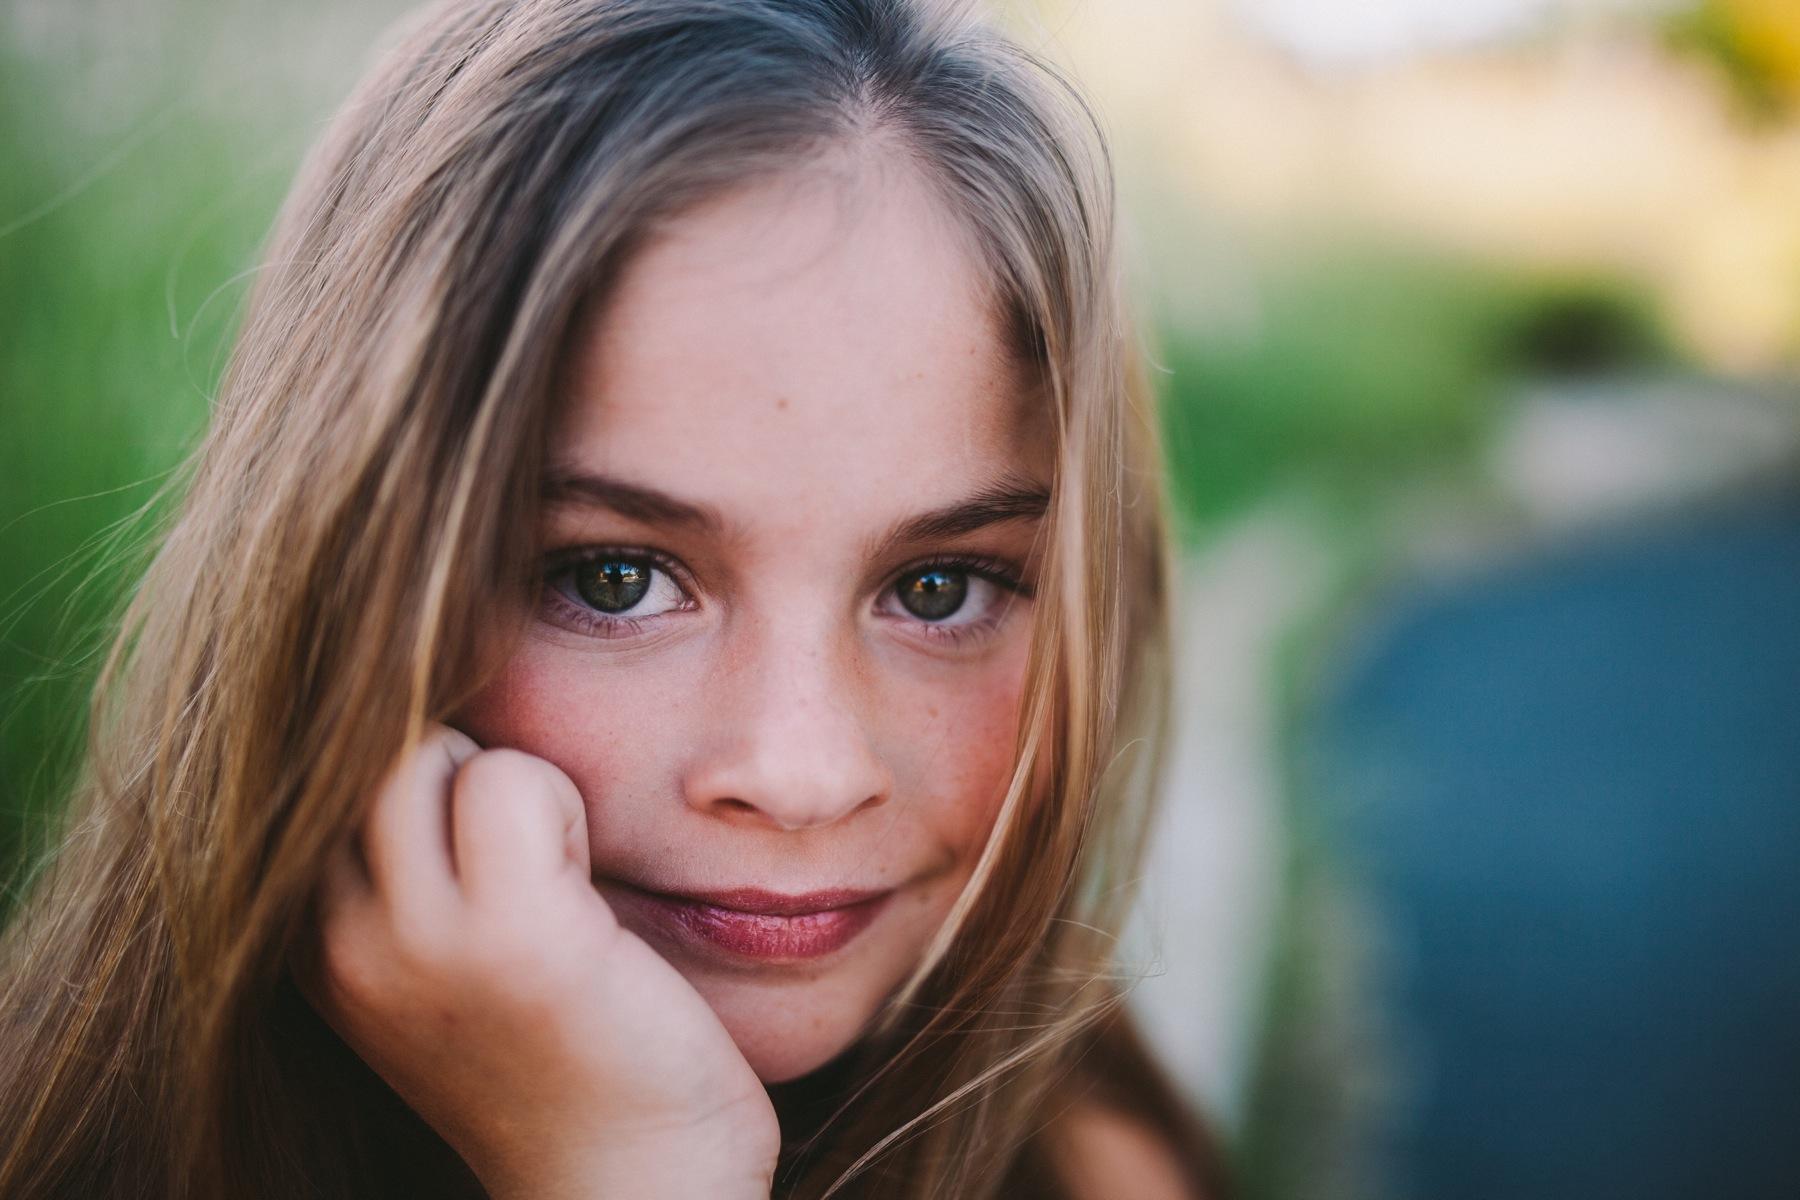 Sonora Tuolumne County Kids Family Photography Shoot 7.jpg